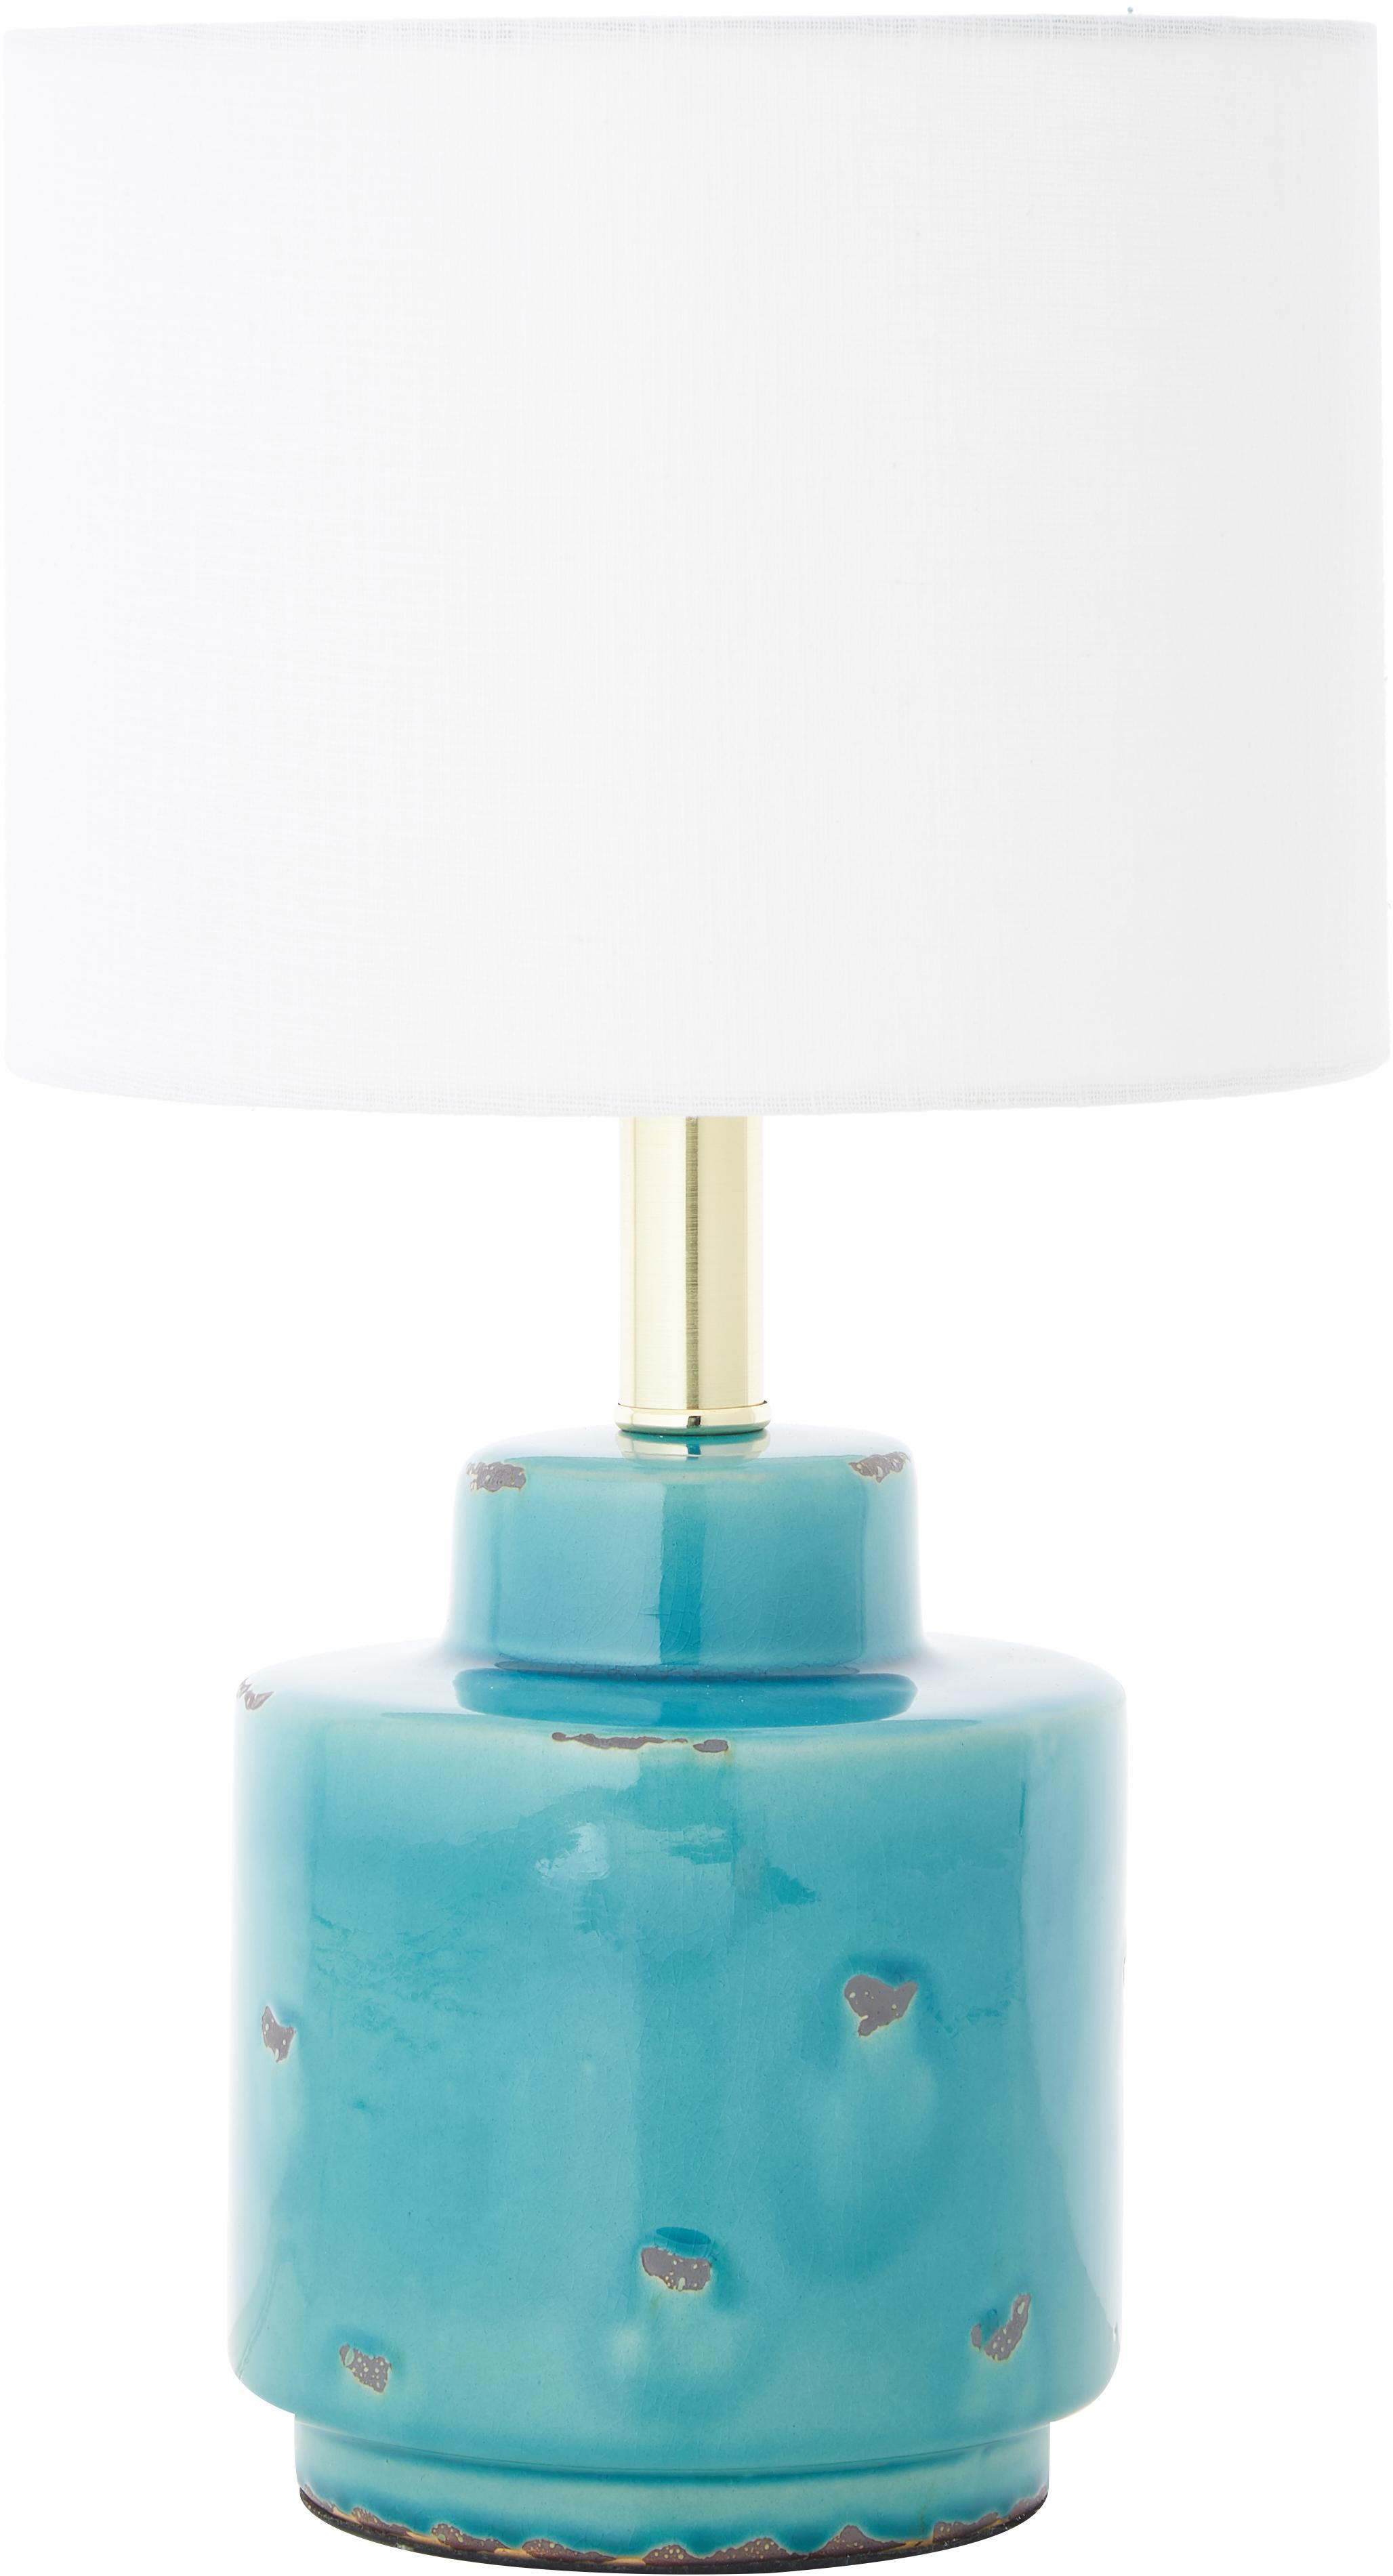 Tafellamp Cous, Lampenkap: polyester, Lampvoet: keramiek met antieke fini, Lampenkap: wit.  Lampvoet: blauw met antieke finish, Ø 24 x H 42 cm